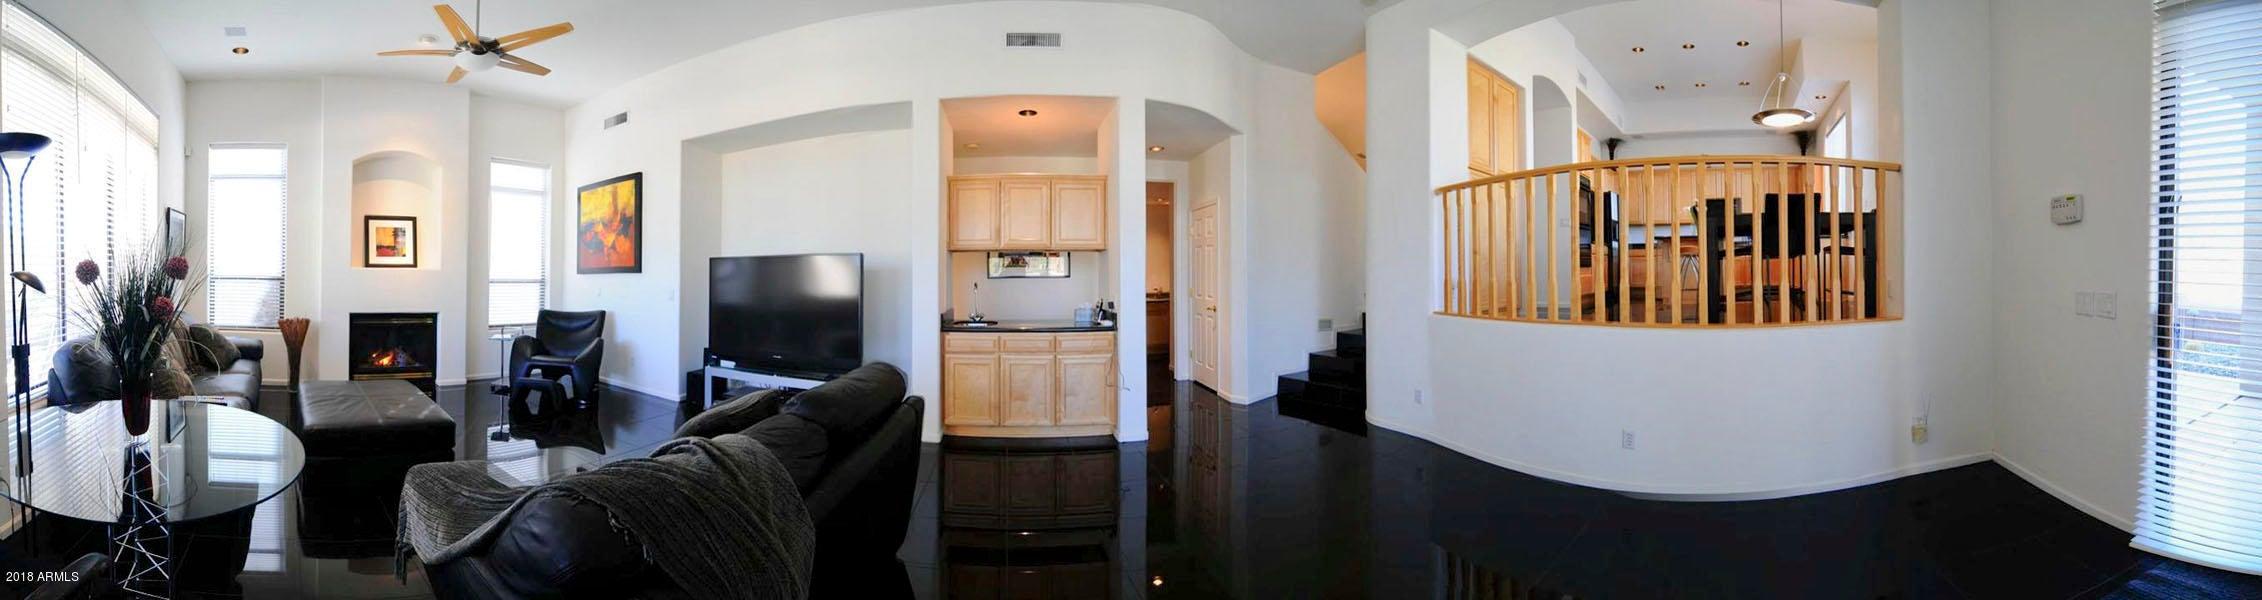 MLS 5818816 5232 E HASHKNIFE Road, Phoenix, AZ 85054 Phoenix AZ Desert Ridge